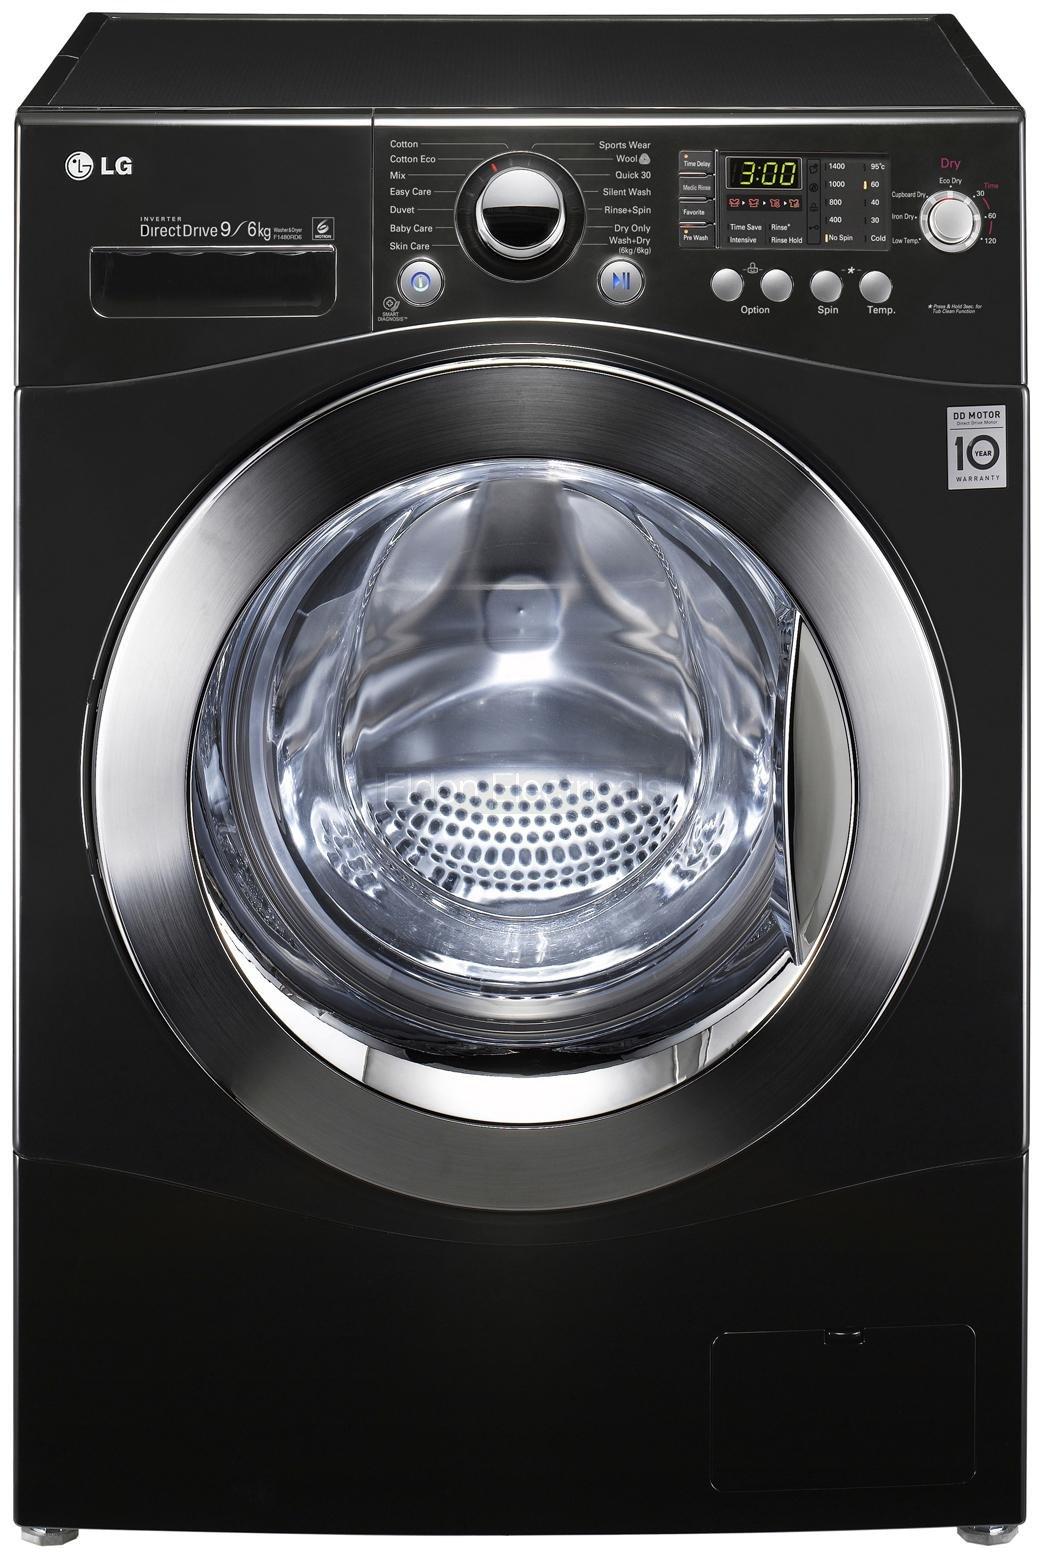 lg 3470 dryer manual